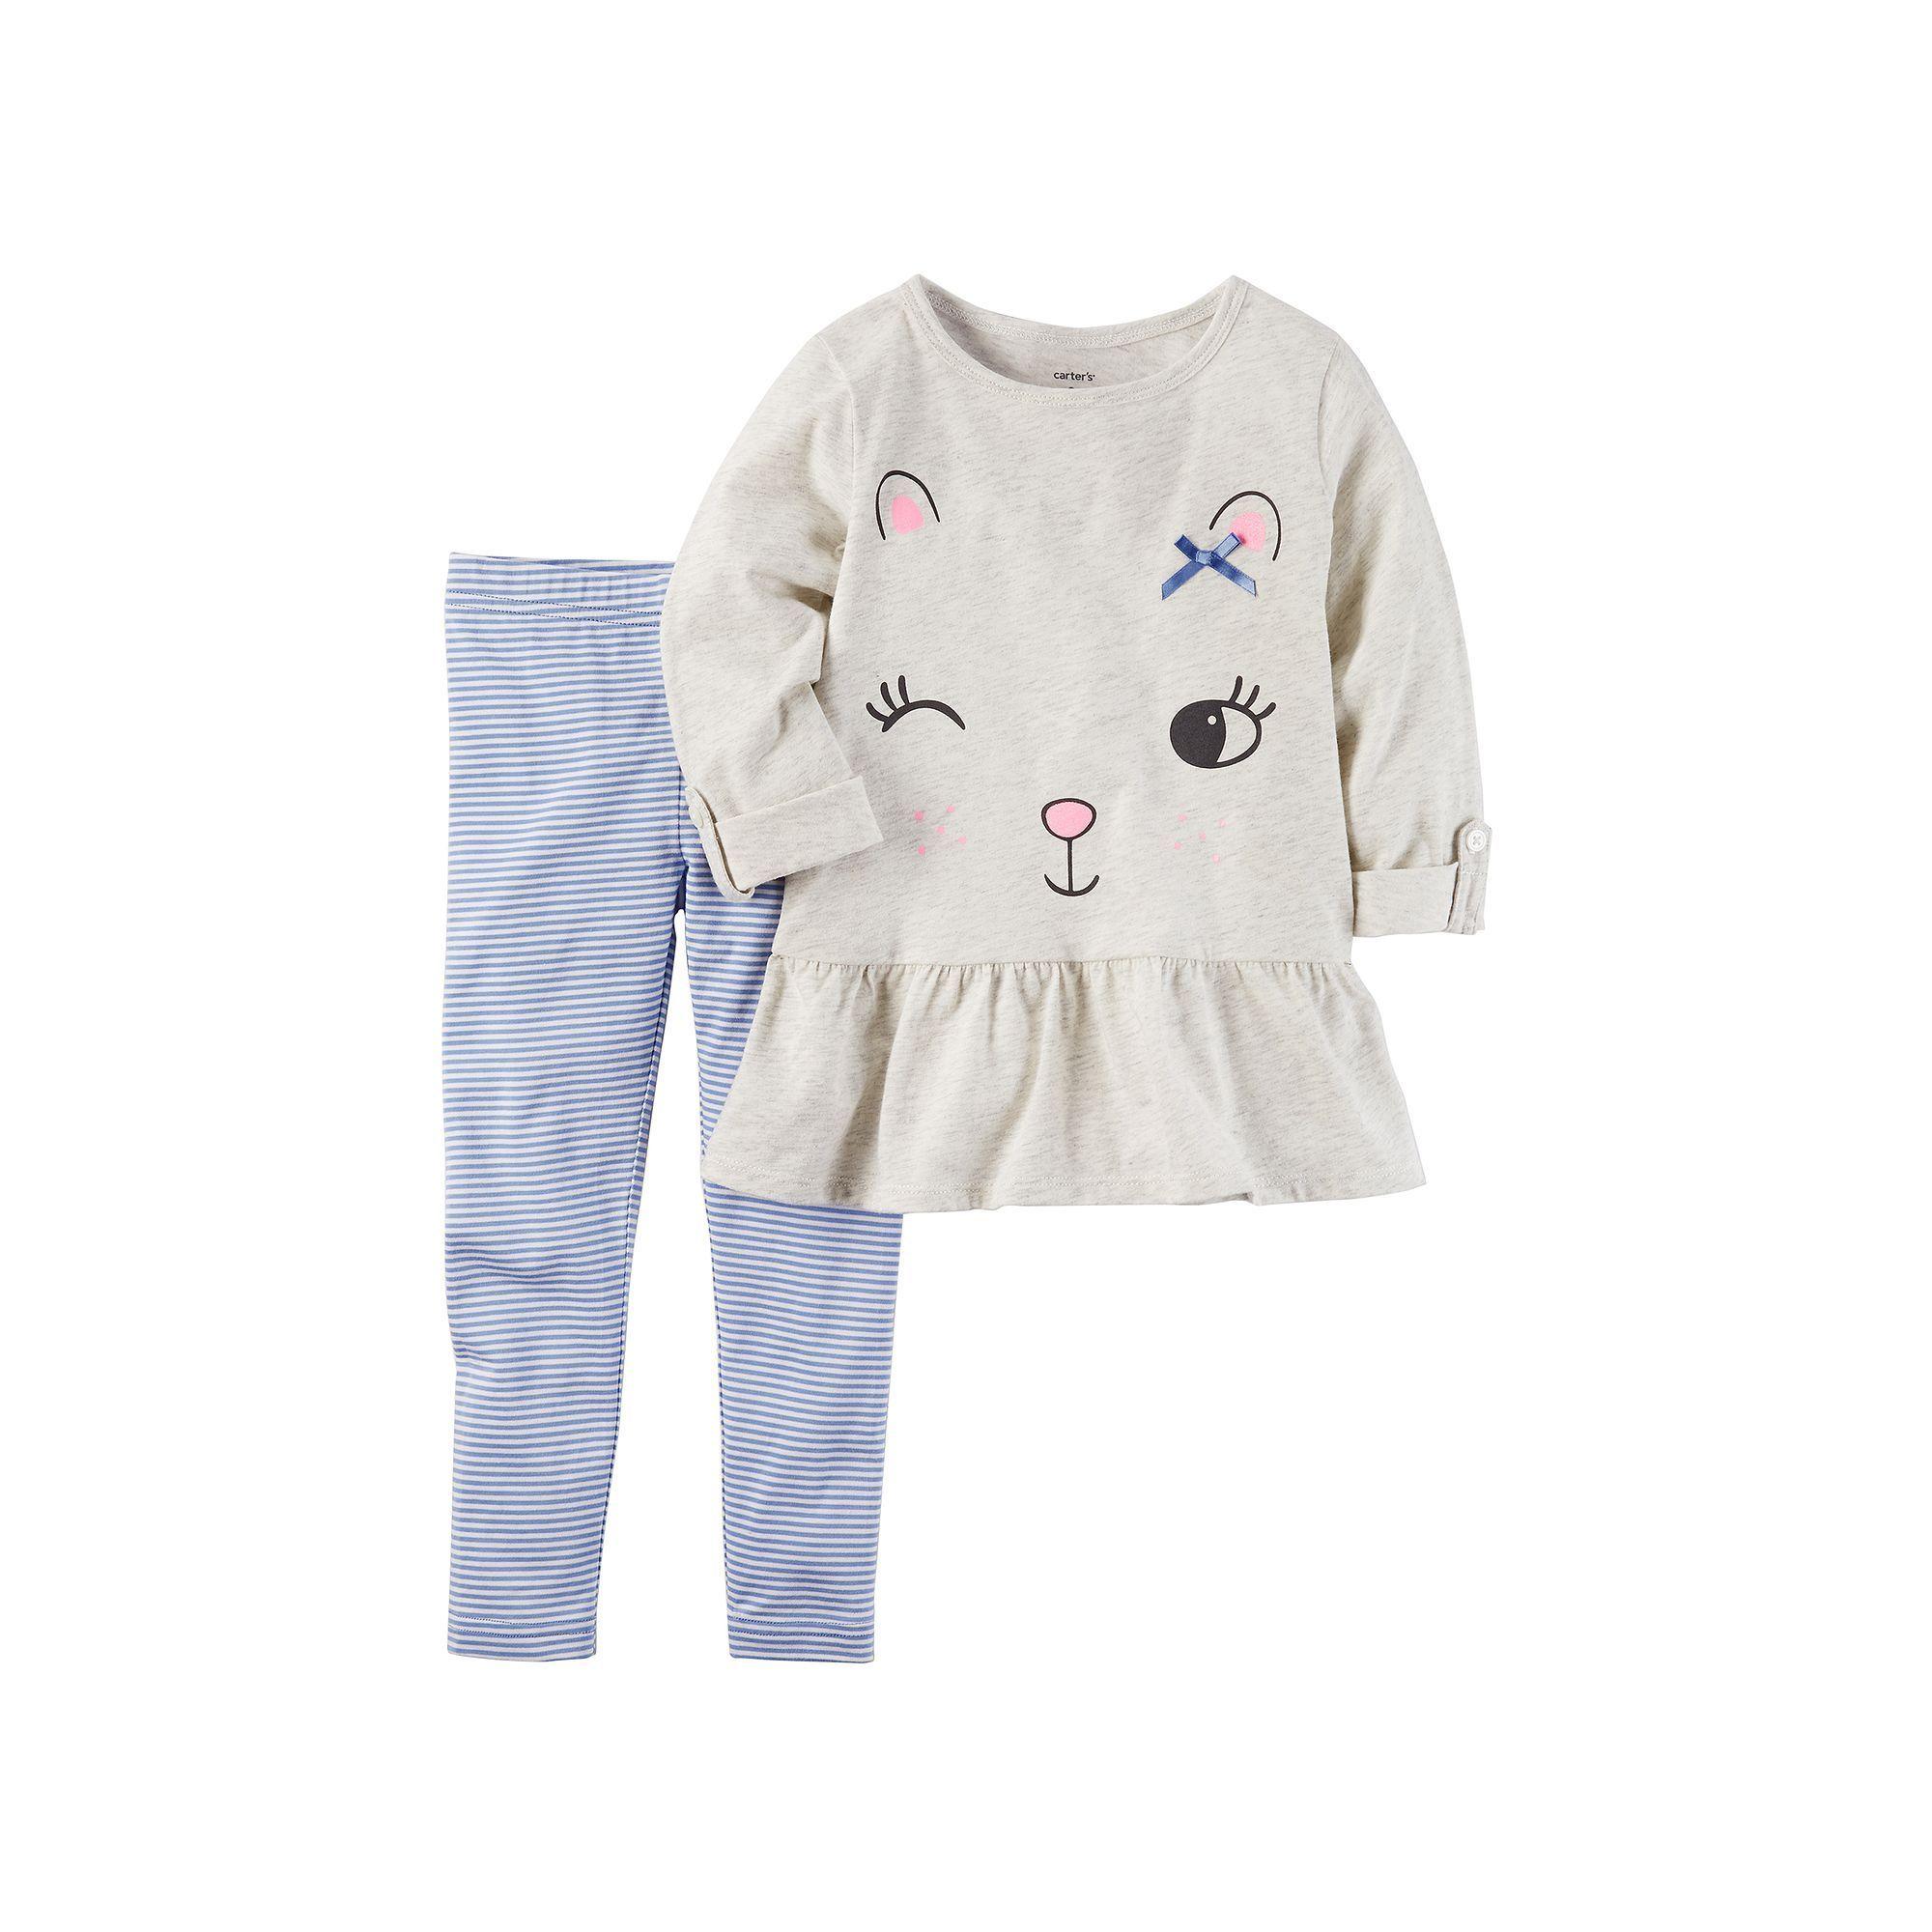 b6c2372b19 Toddler Girl Carter's Winking Cat Peplum Tunic & Striped Leggings ...